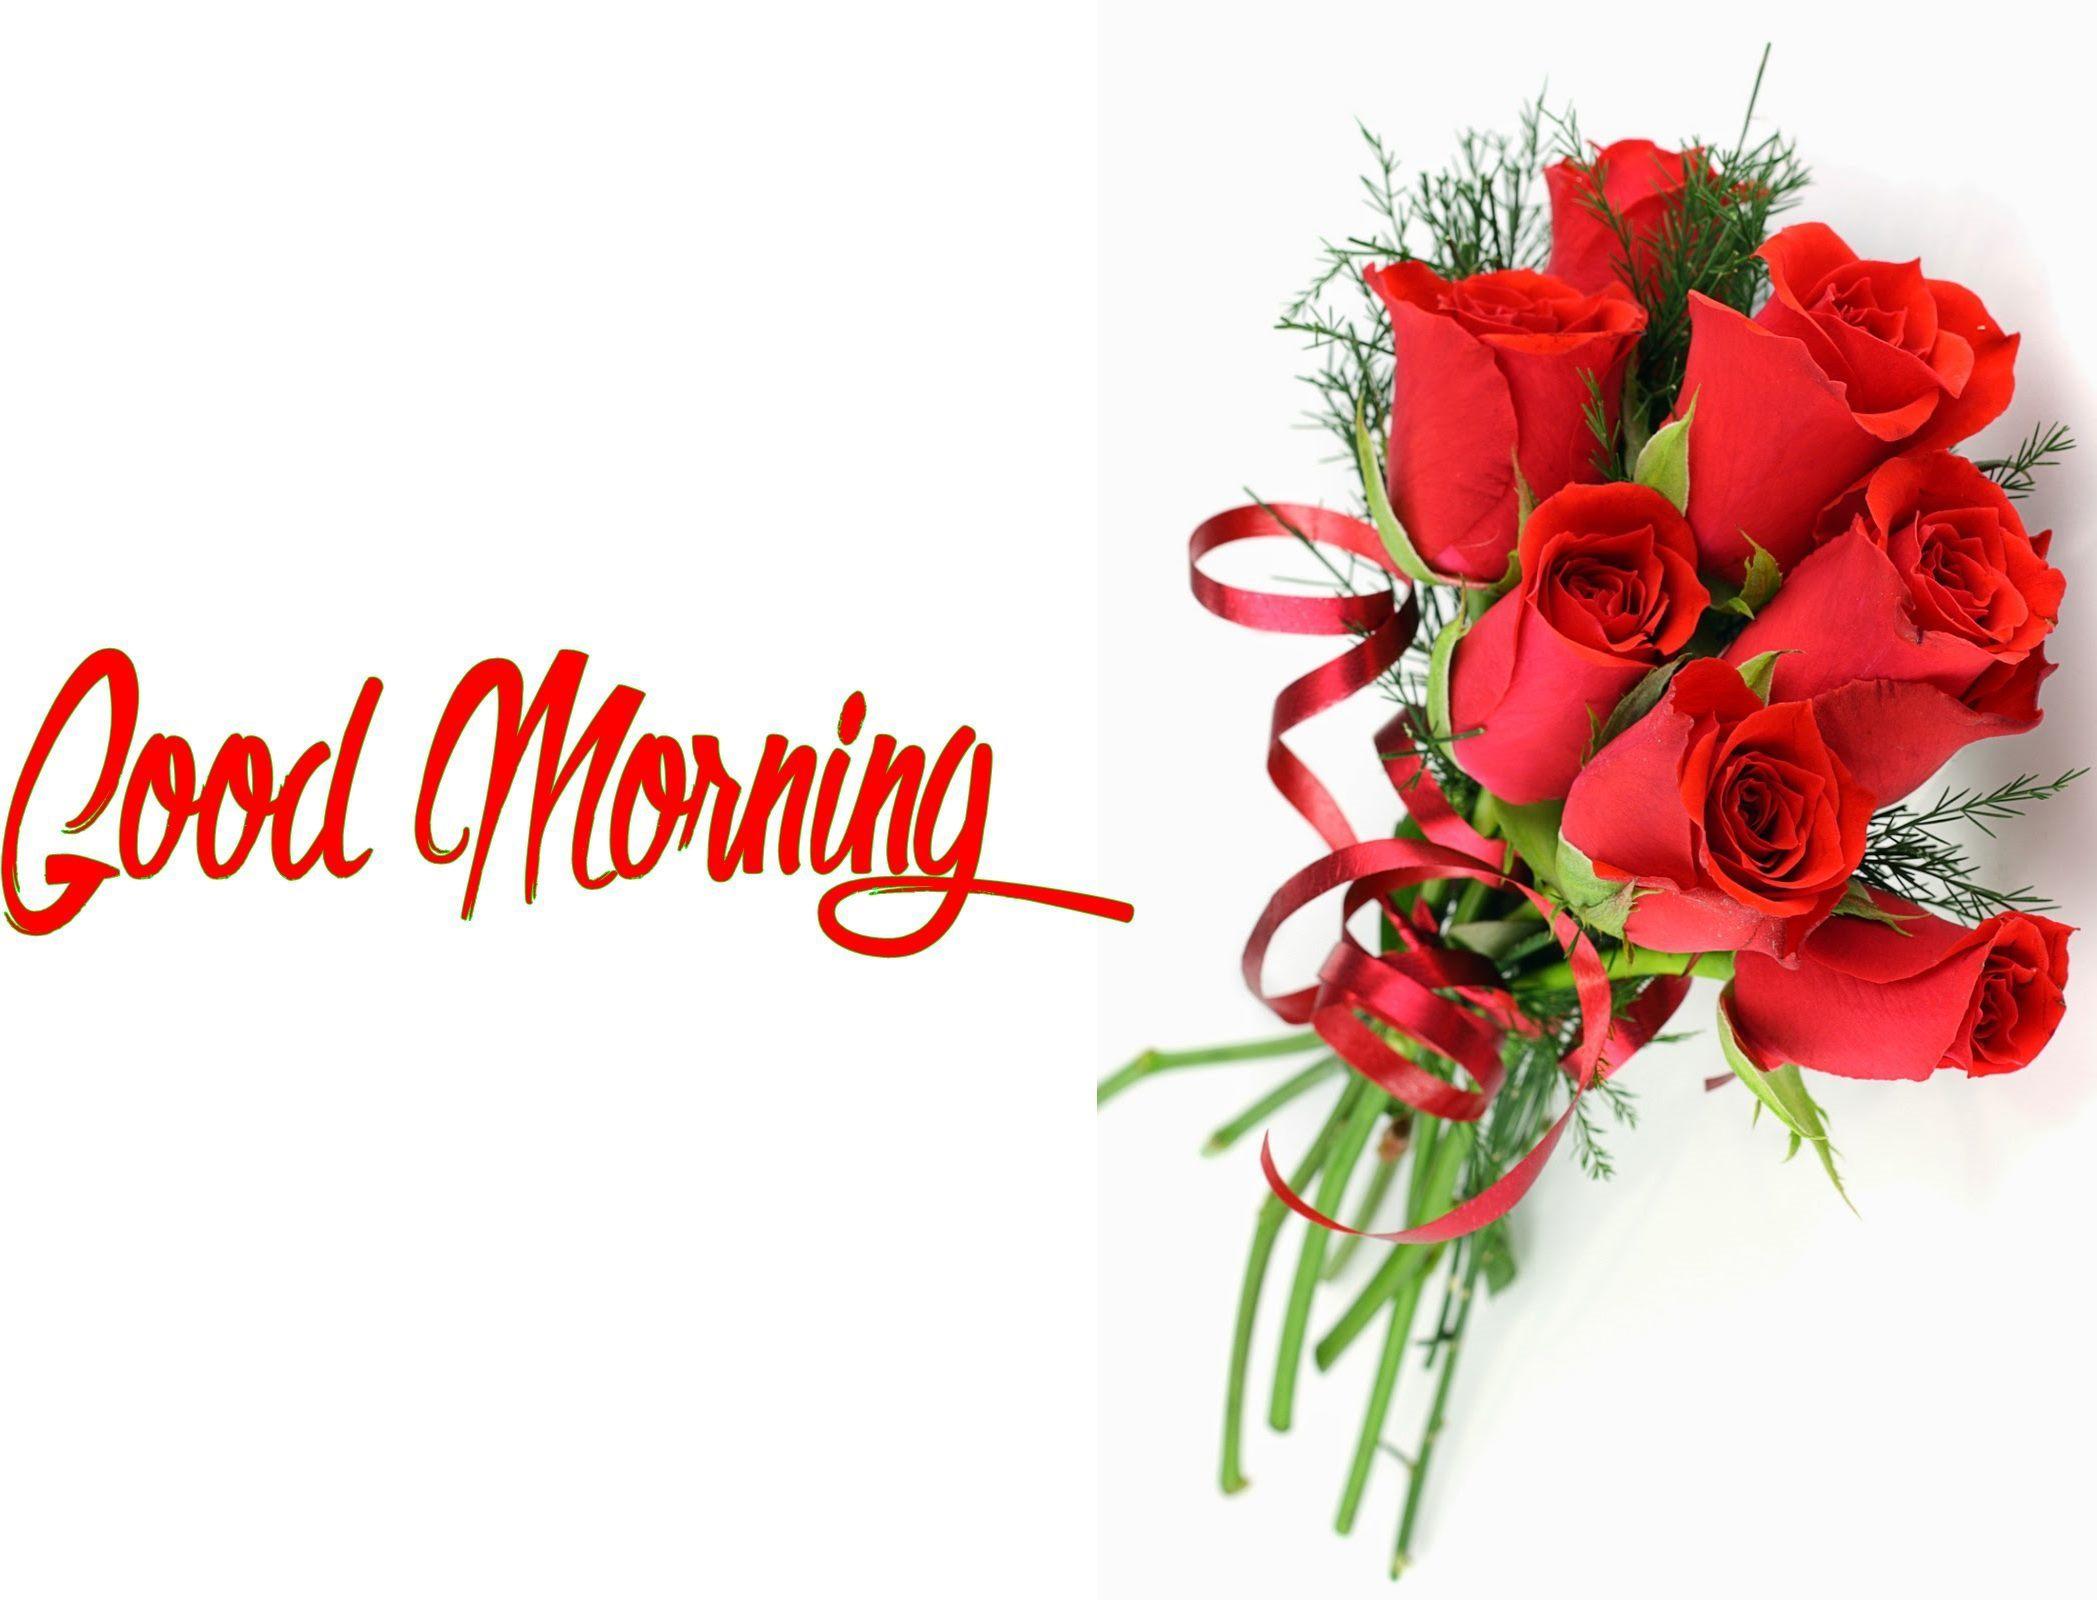 Good Morning Flowers Bunch Hd Wallpaper 00195 Wallpaperk - Flowers Rose Good Morning Image Hd , HD Wallpaper & Backgrounds